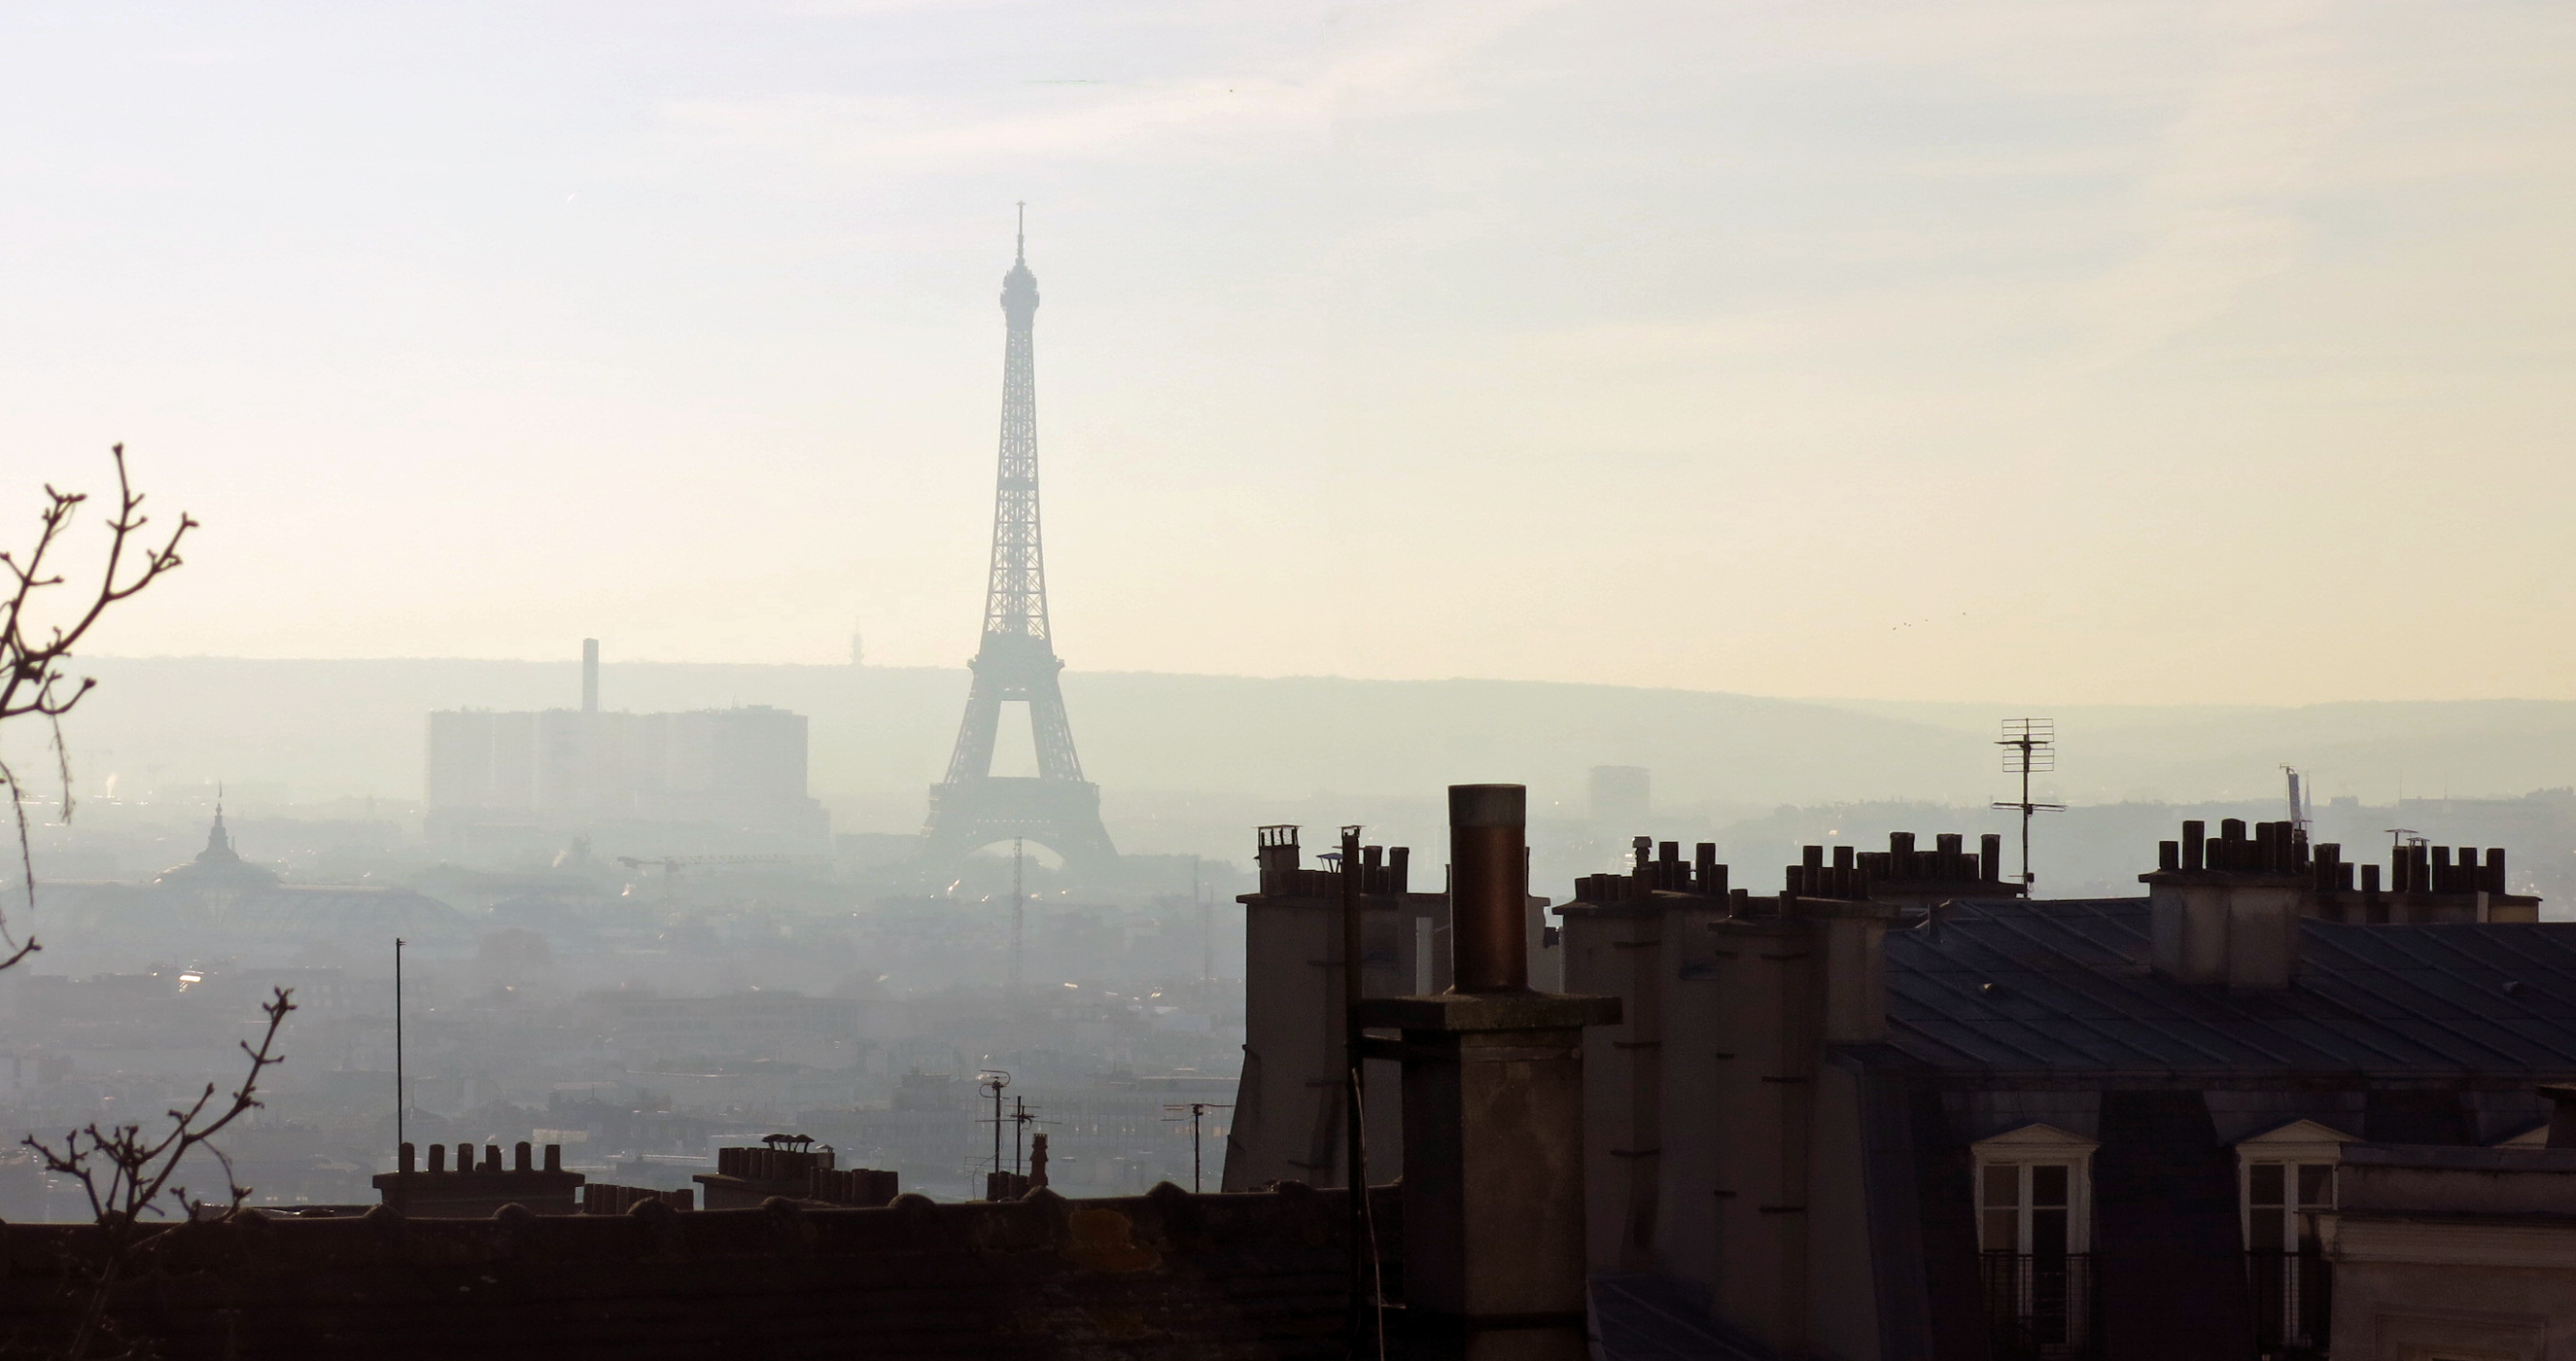 En 2020, la RATP testera des véhicules autonomes dans les rues de Paris